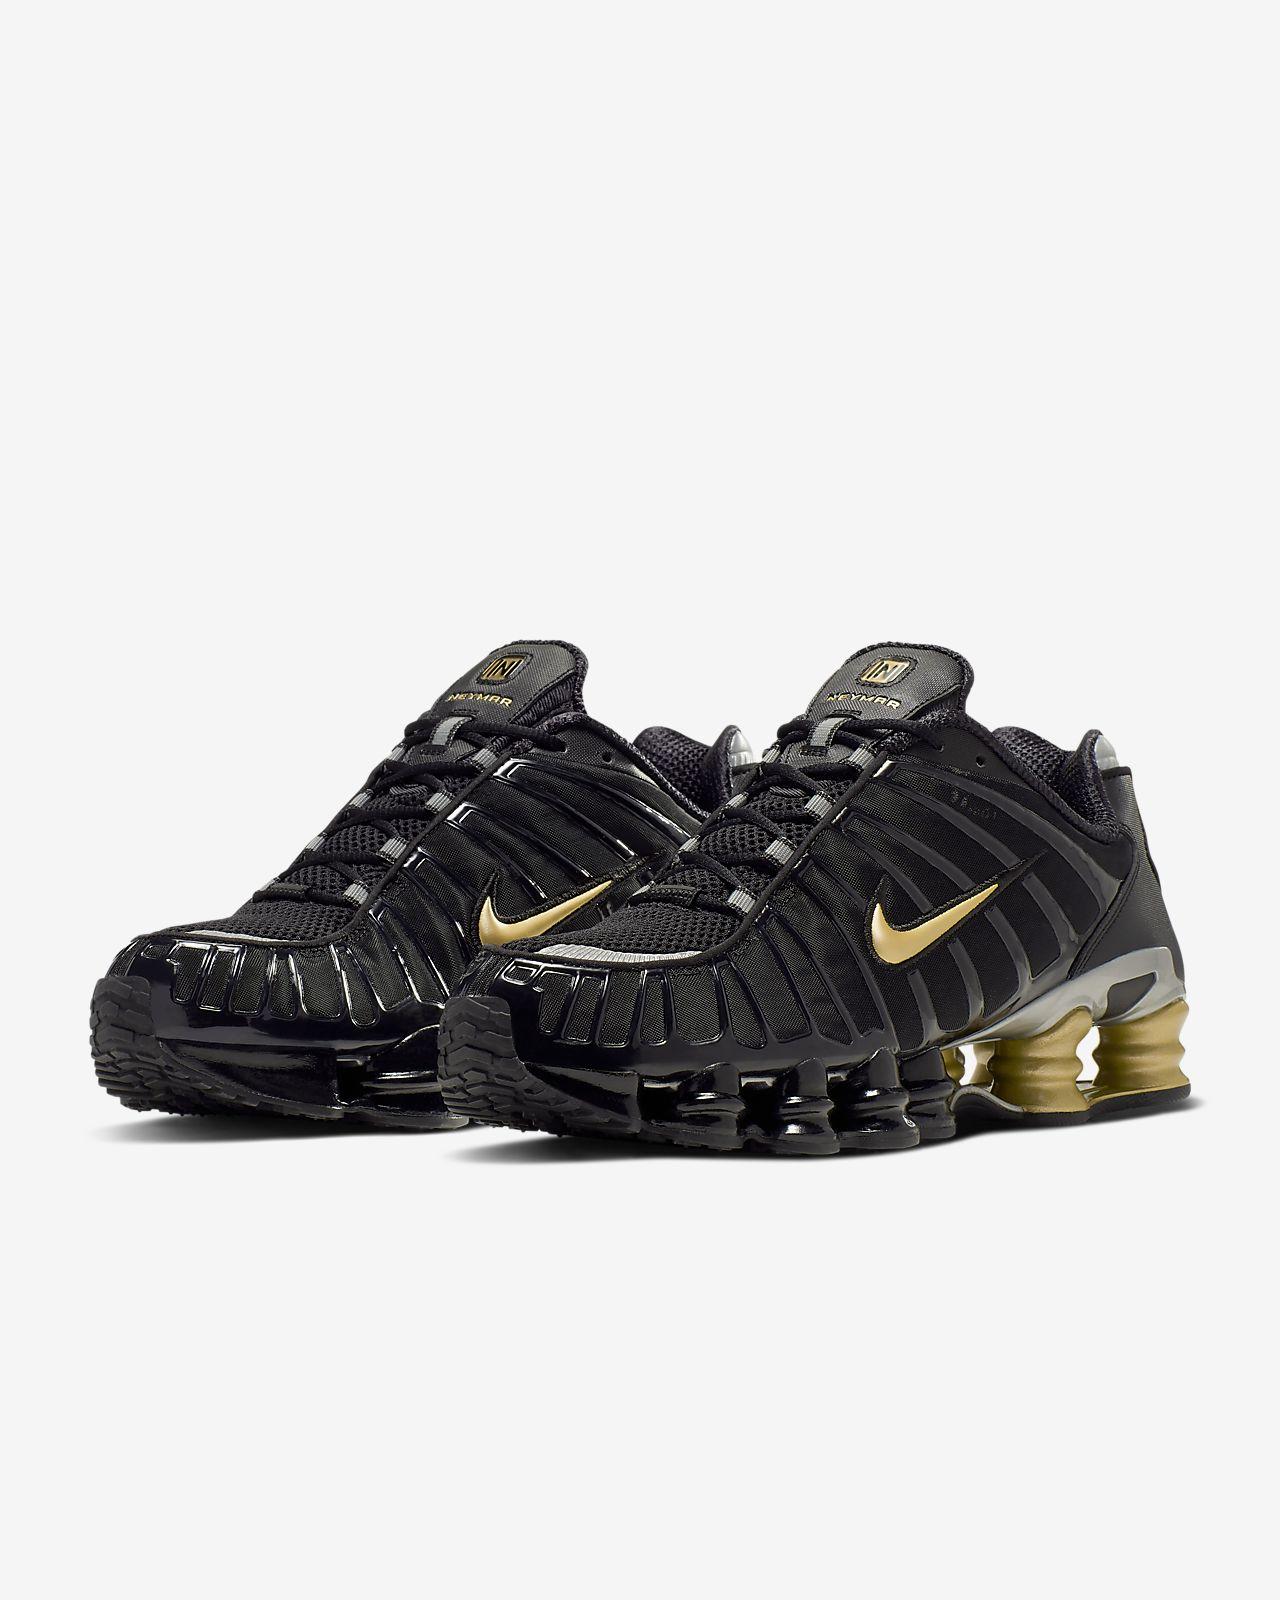 classic styles temperament shoes casual shoes get nike shox negro oro 9e653 8472c